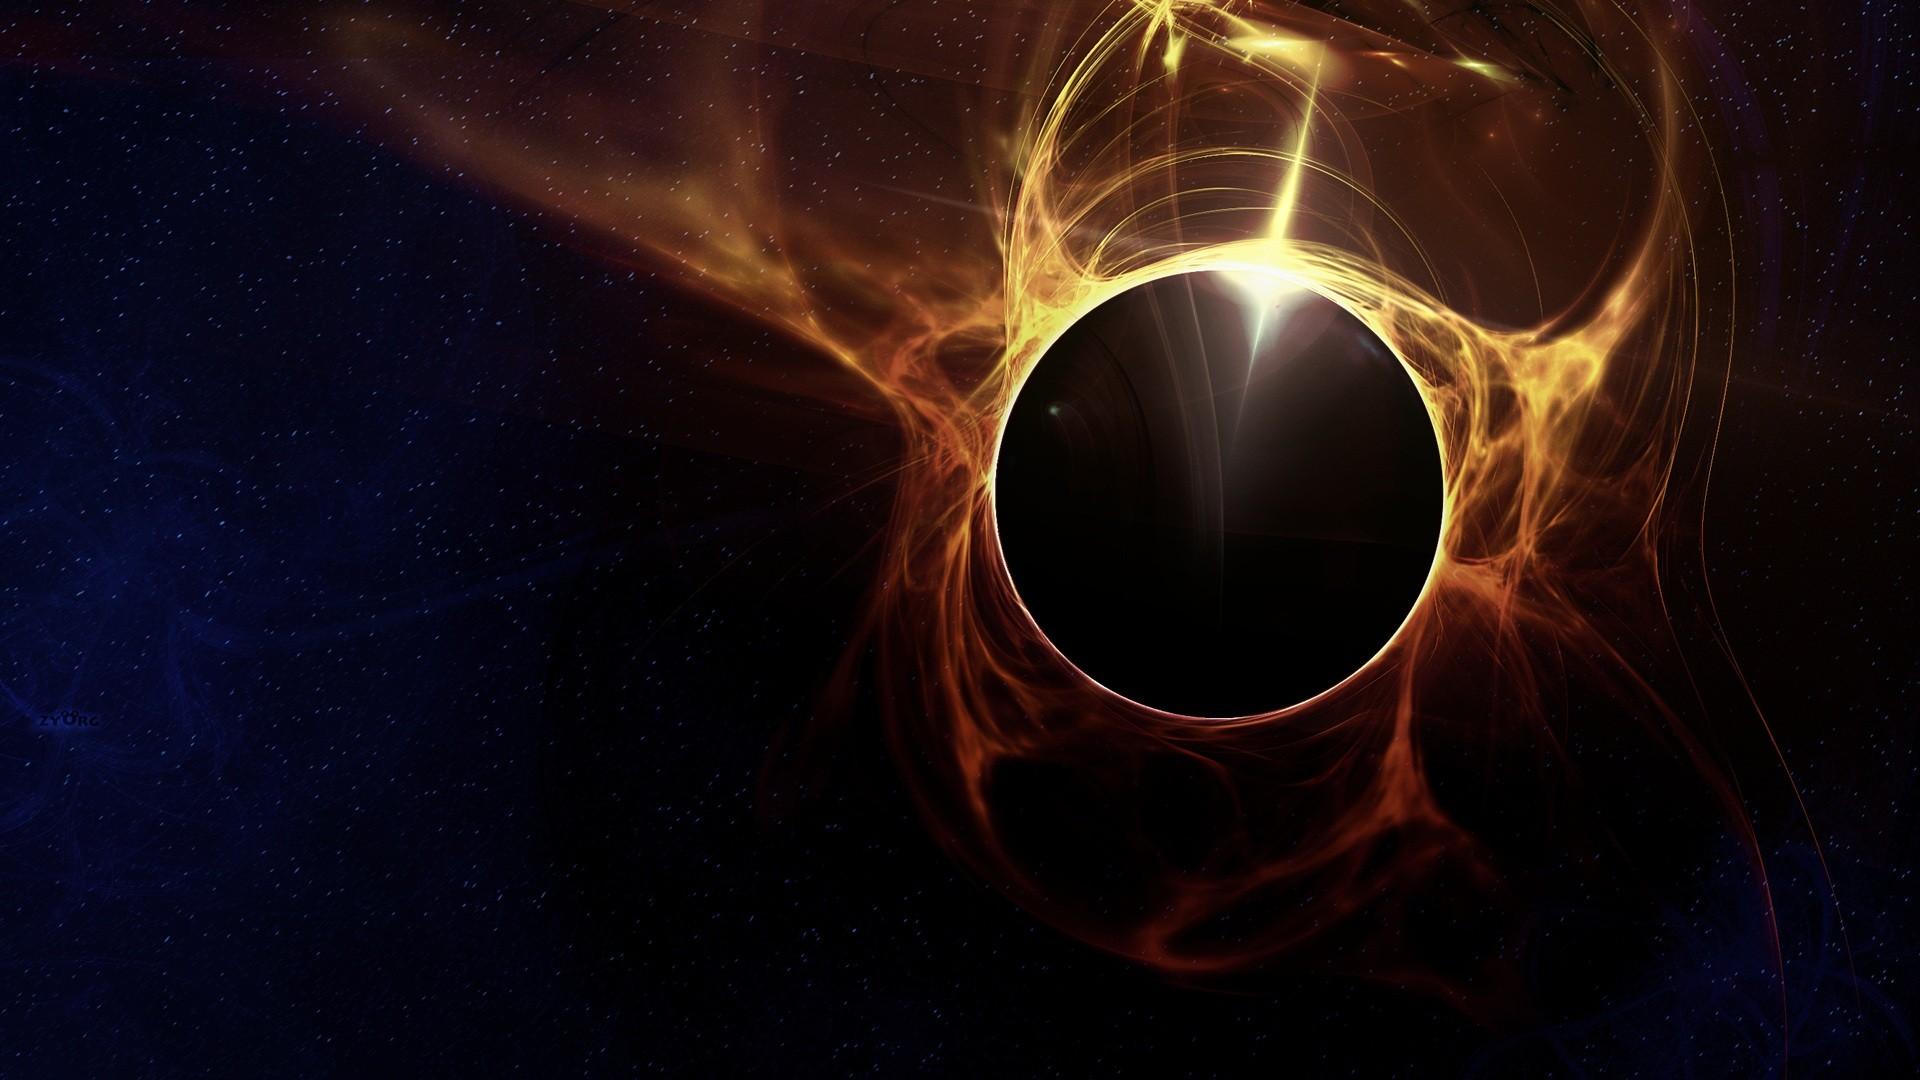 Eclipse wallpaper – imagens